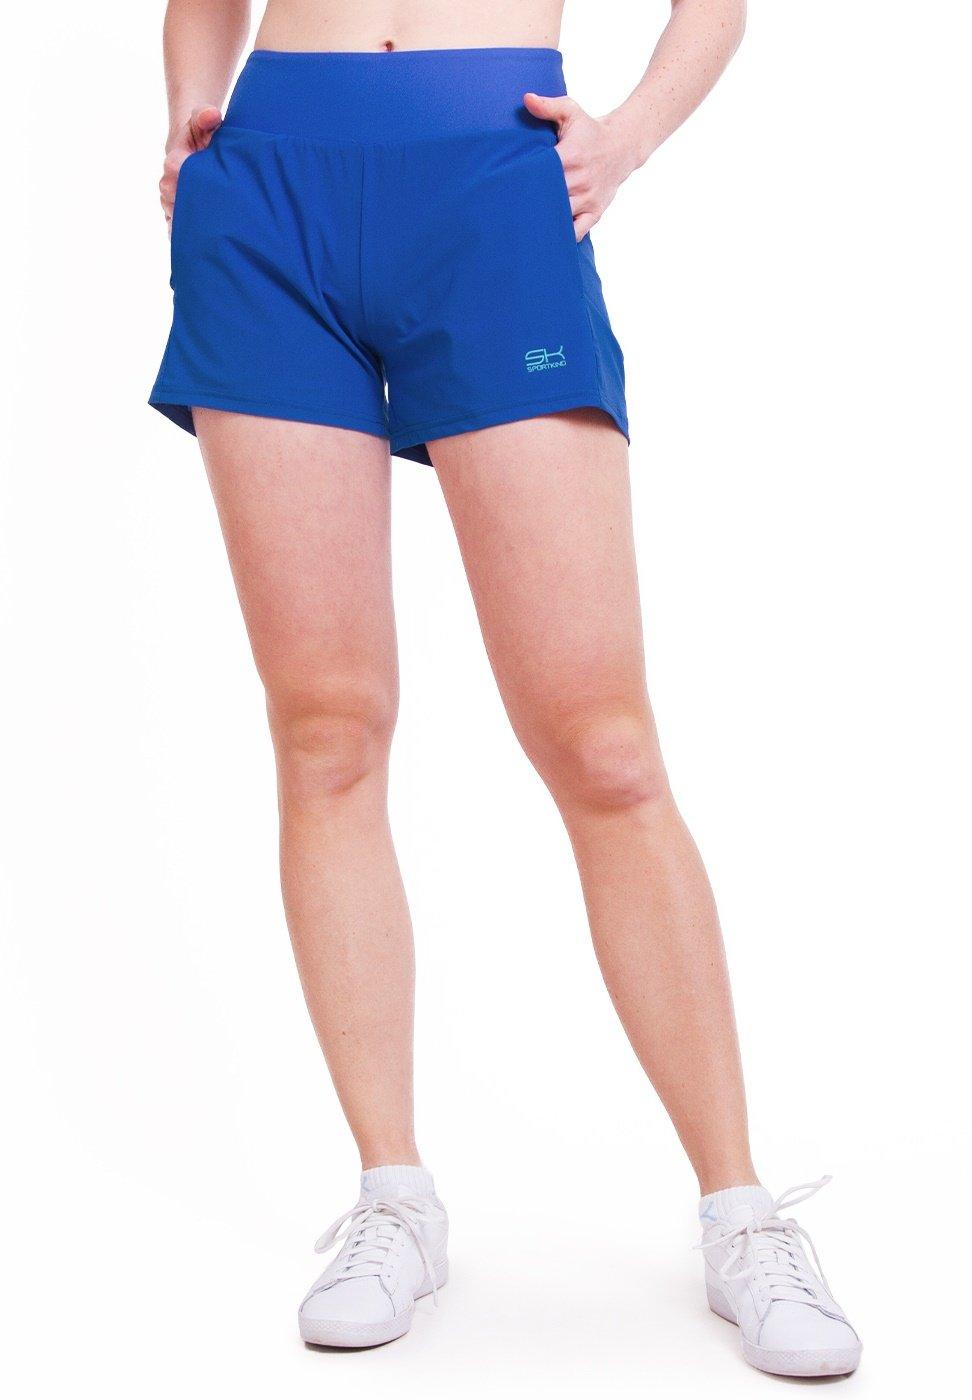 Damen 2-IN-1 SHORTS MIT BALLGÜRTEL - kurze Sporthose